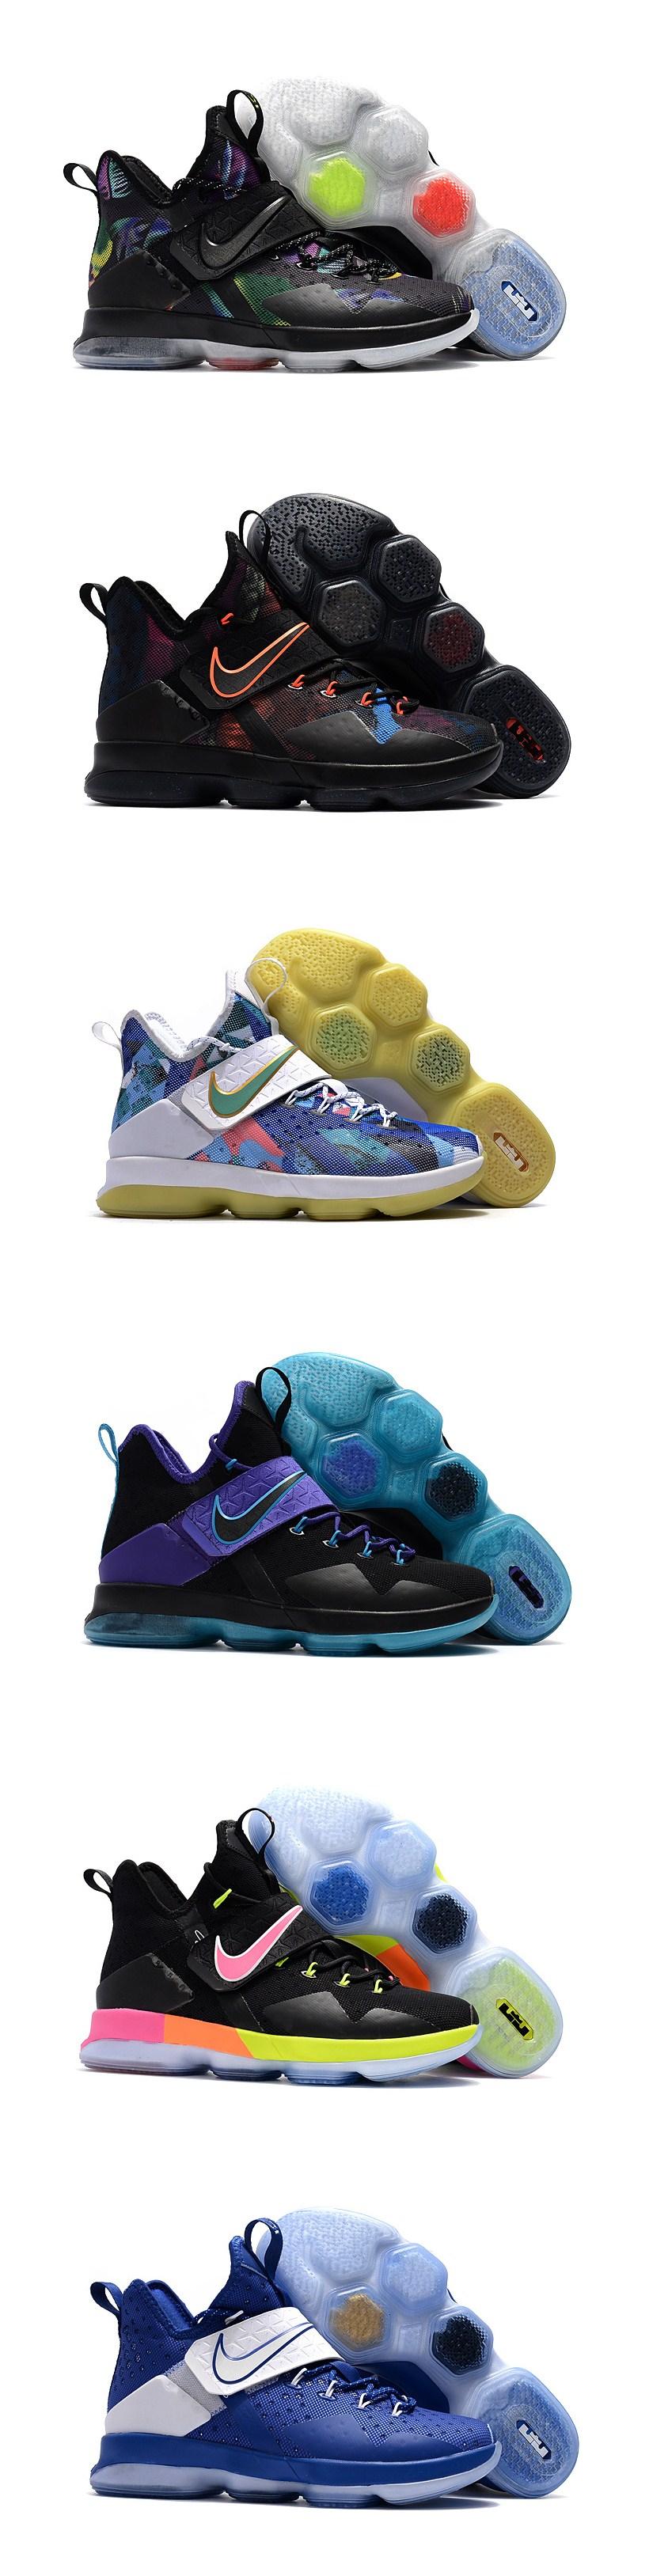 f67669e63041 Cheap LeBron James in Nike LeBron 14 Free Shipping Black Colorful ...